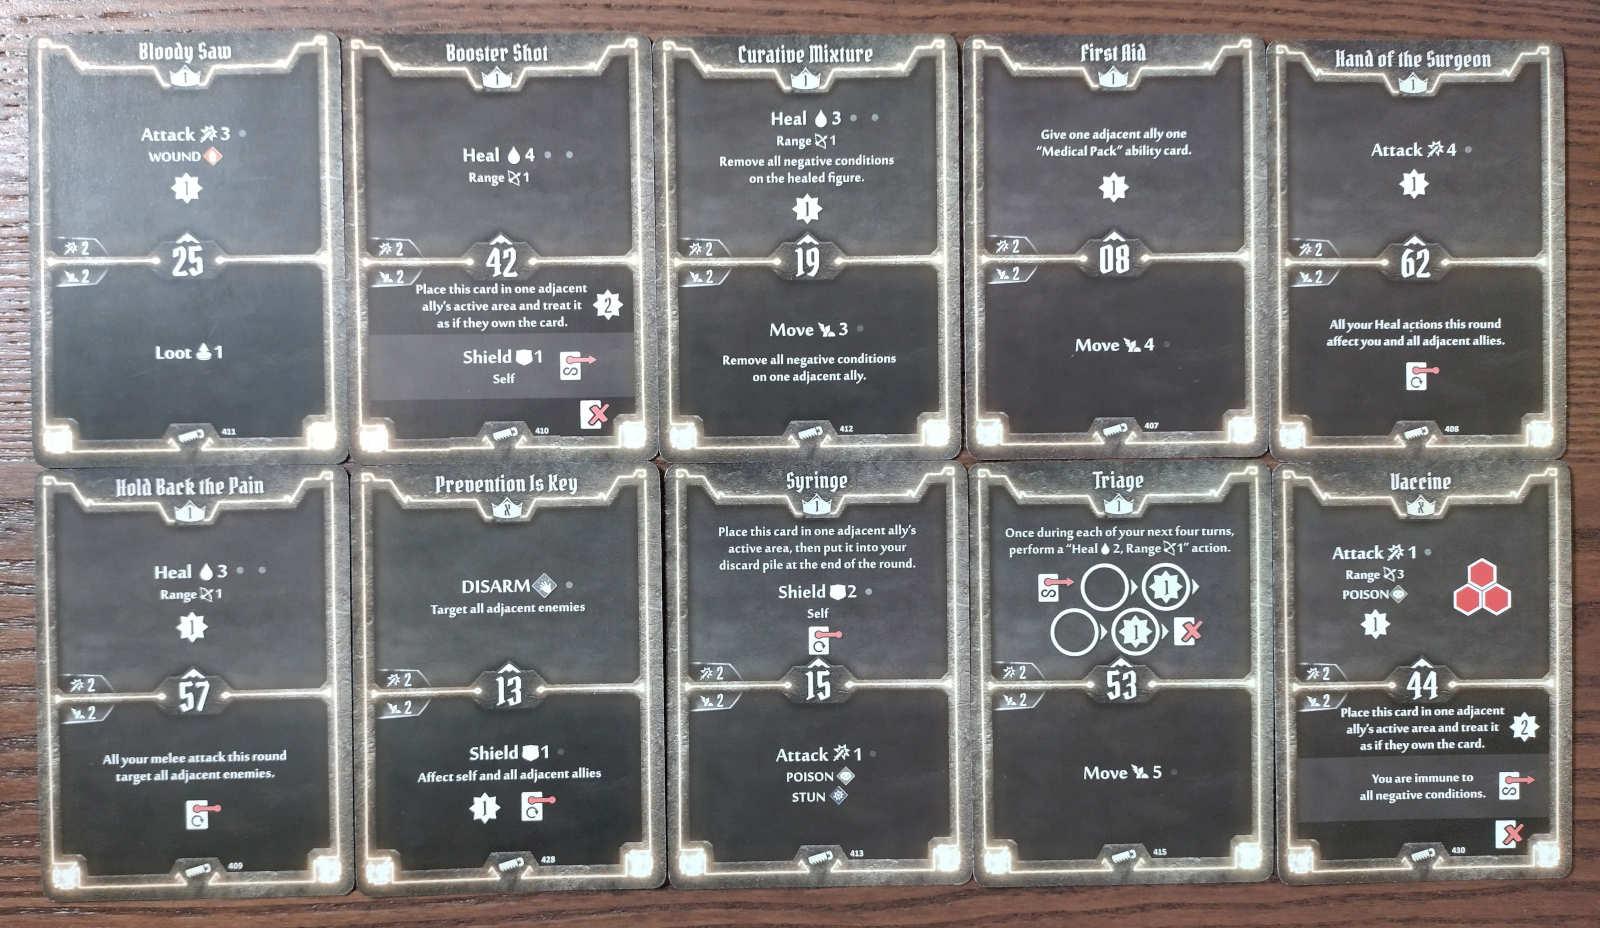 Gloomhaven Sawbones Level 1 build cards